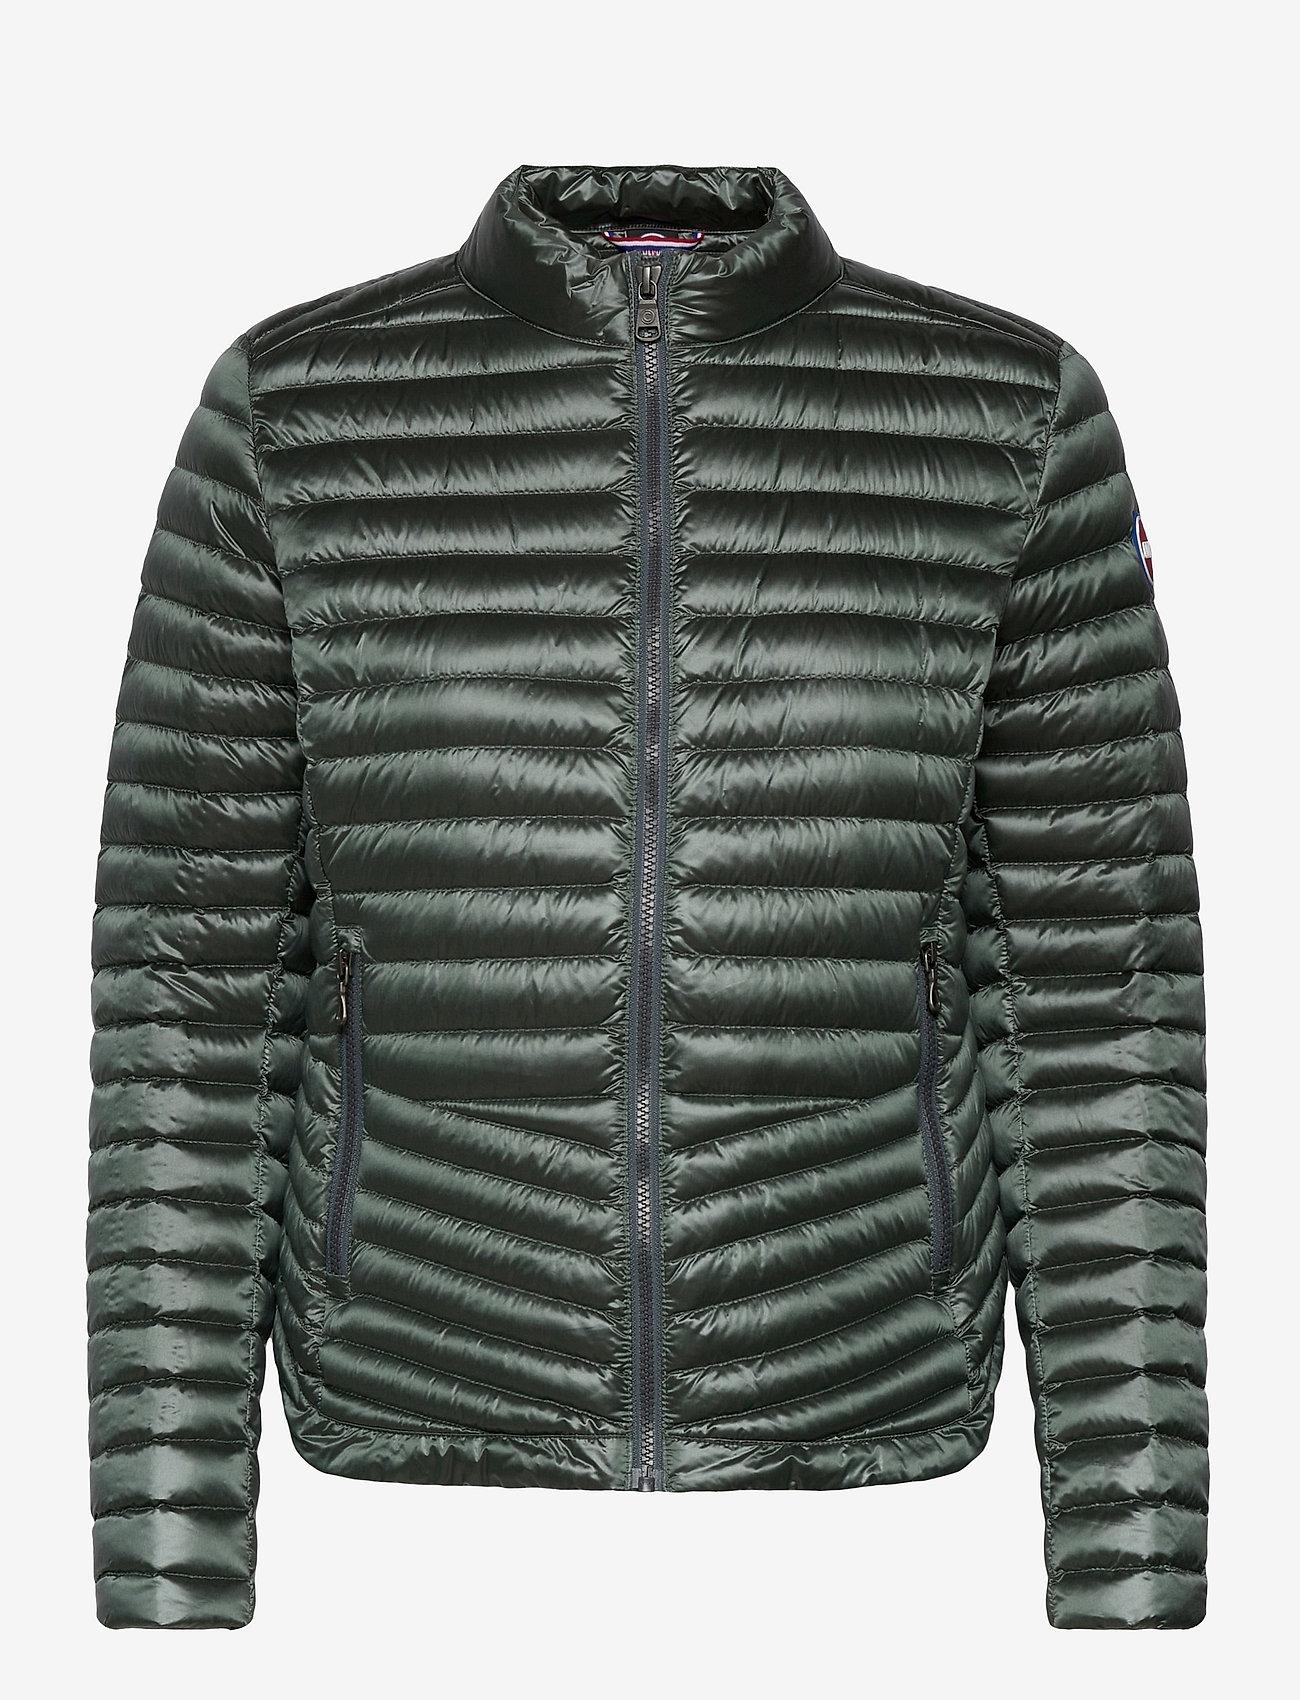 Colmar - LADIES DOWN JACKET - down- & padded jackets - dark mineral - 0